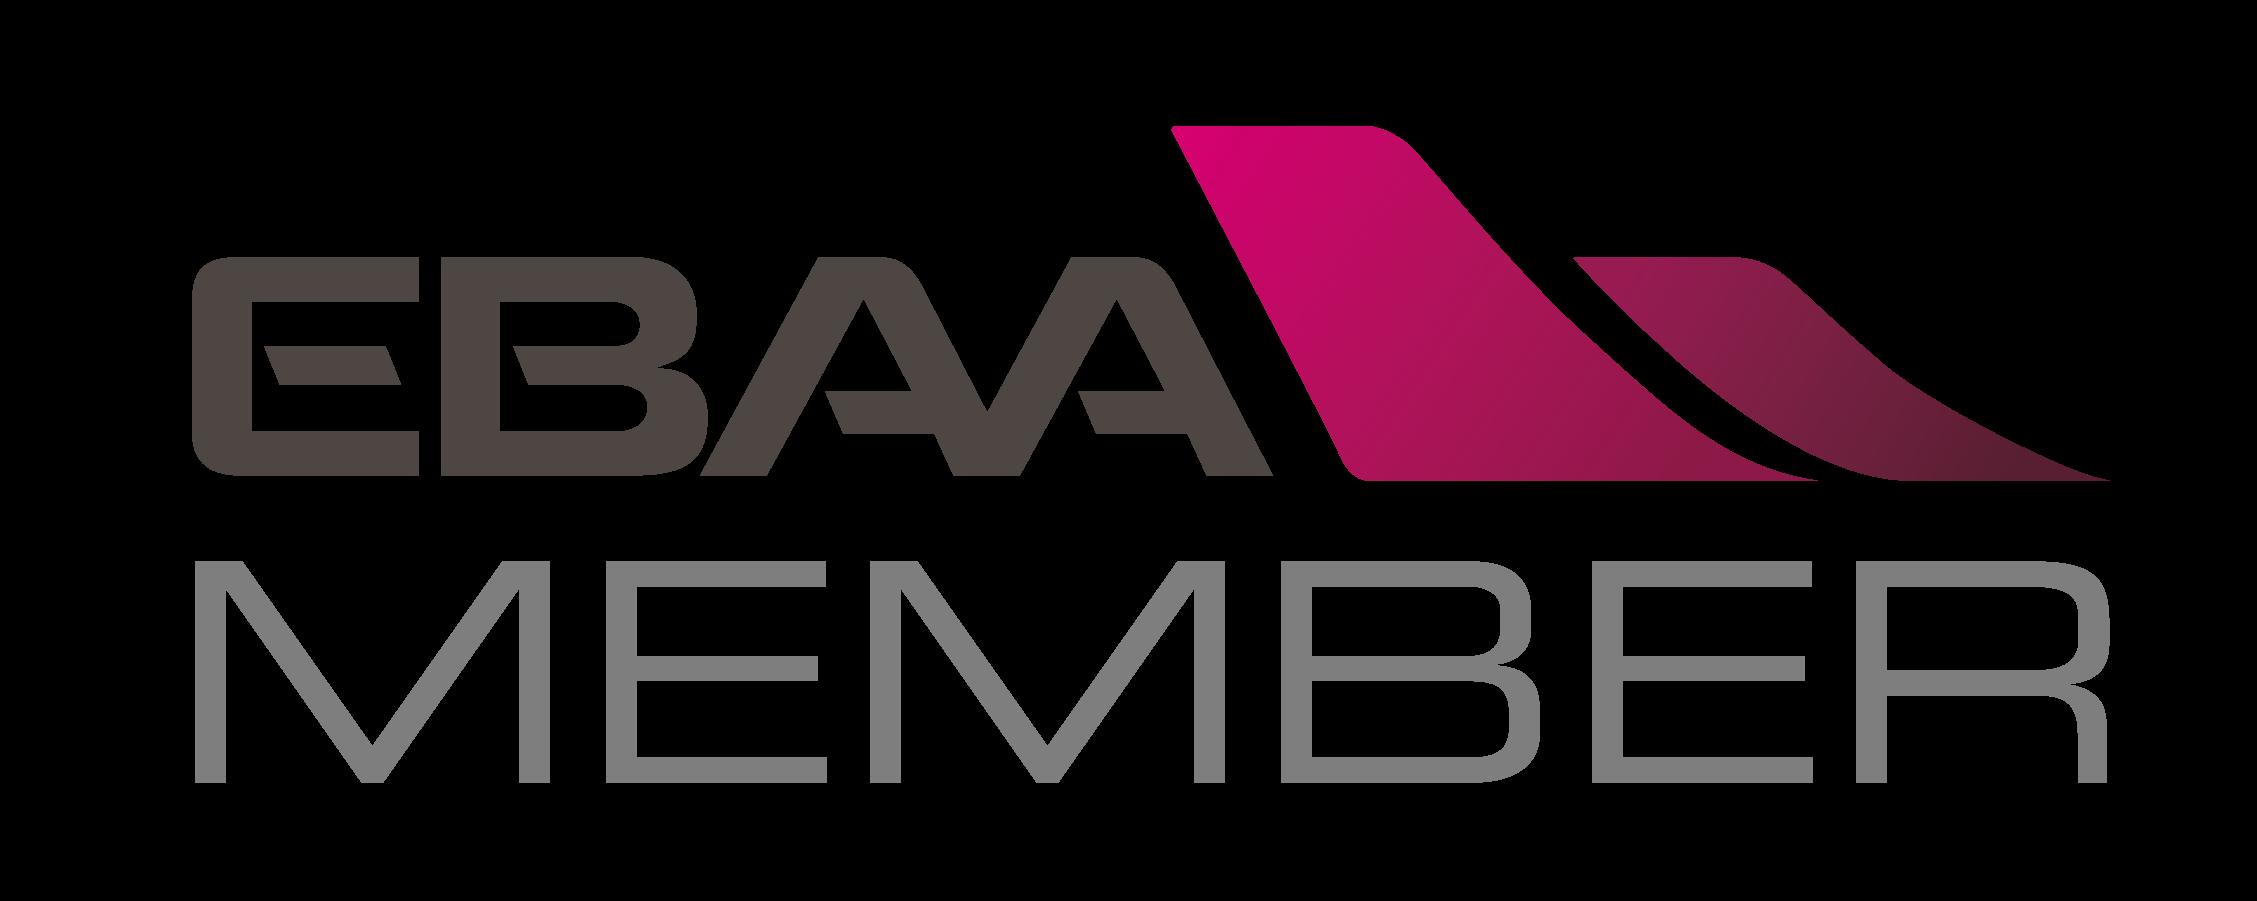 EBAA-Members-logo-stacked (2)